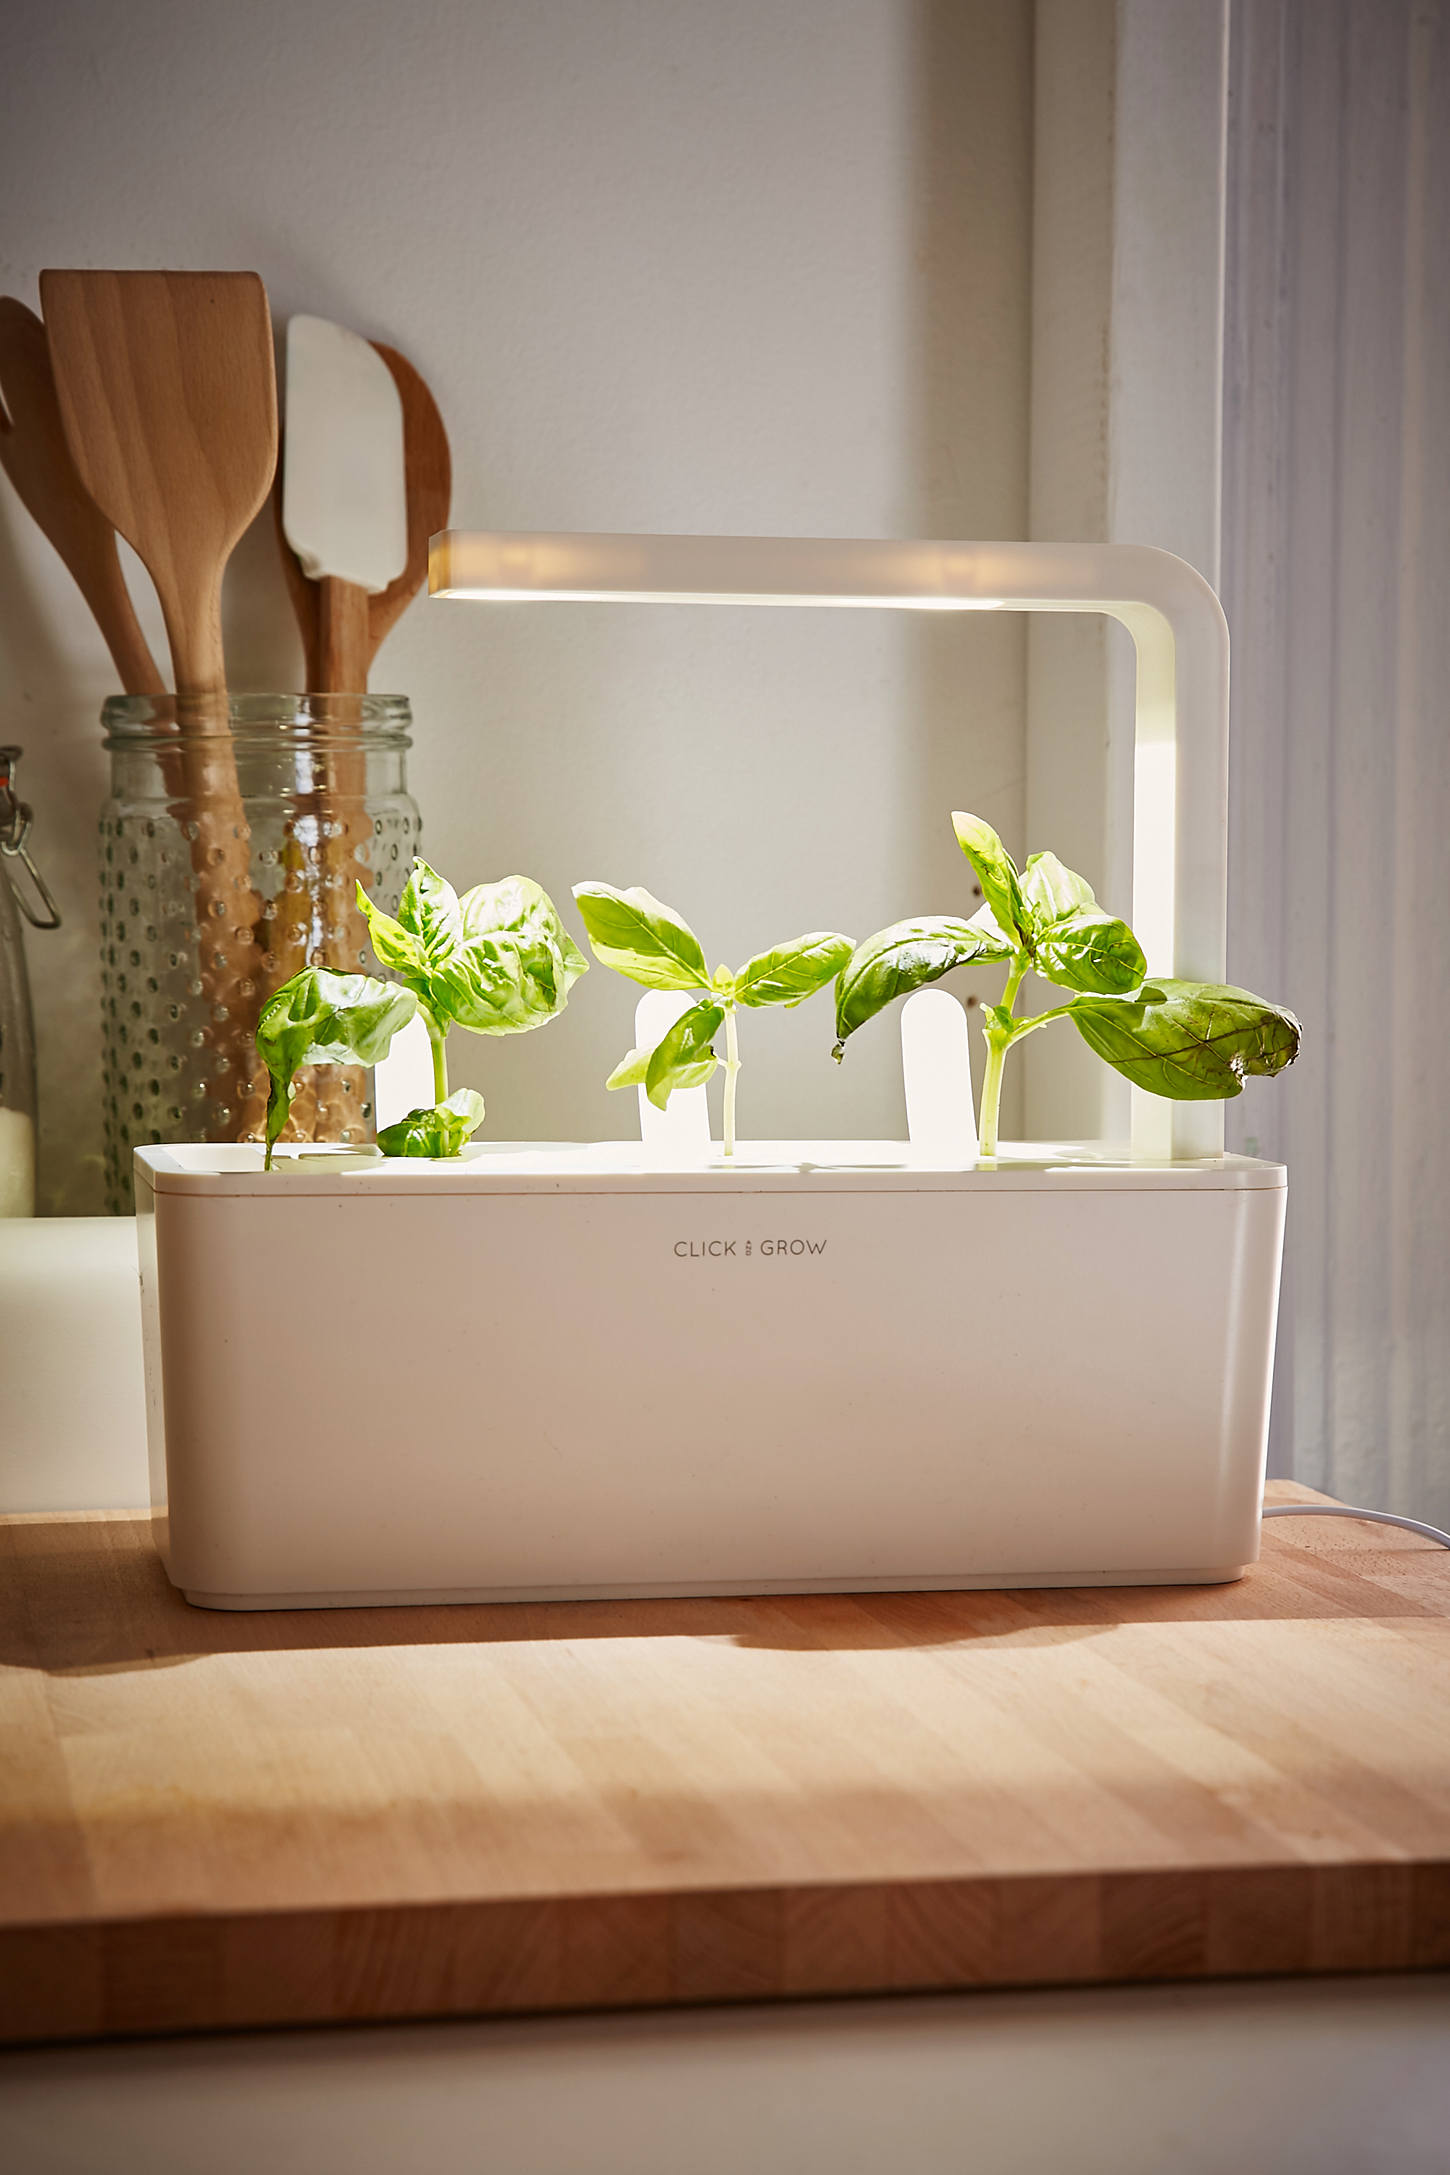 Kitchen Herb Garden Kit Click Grow Smart Herb Garden Starter Kit Urban Outfitters